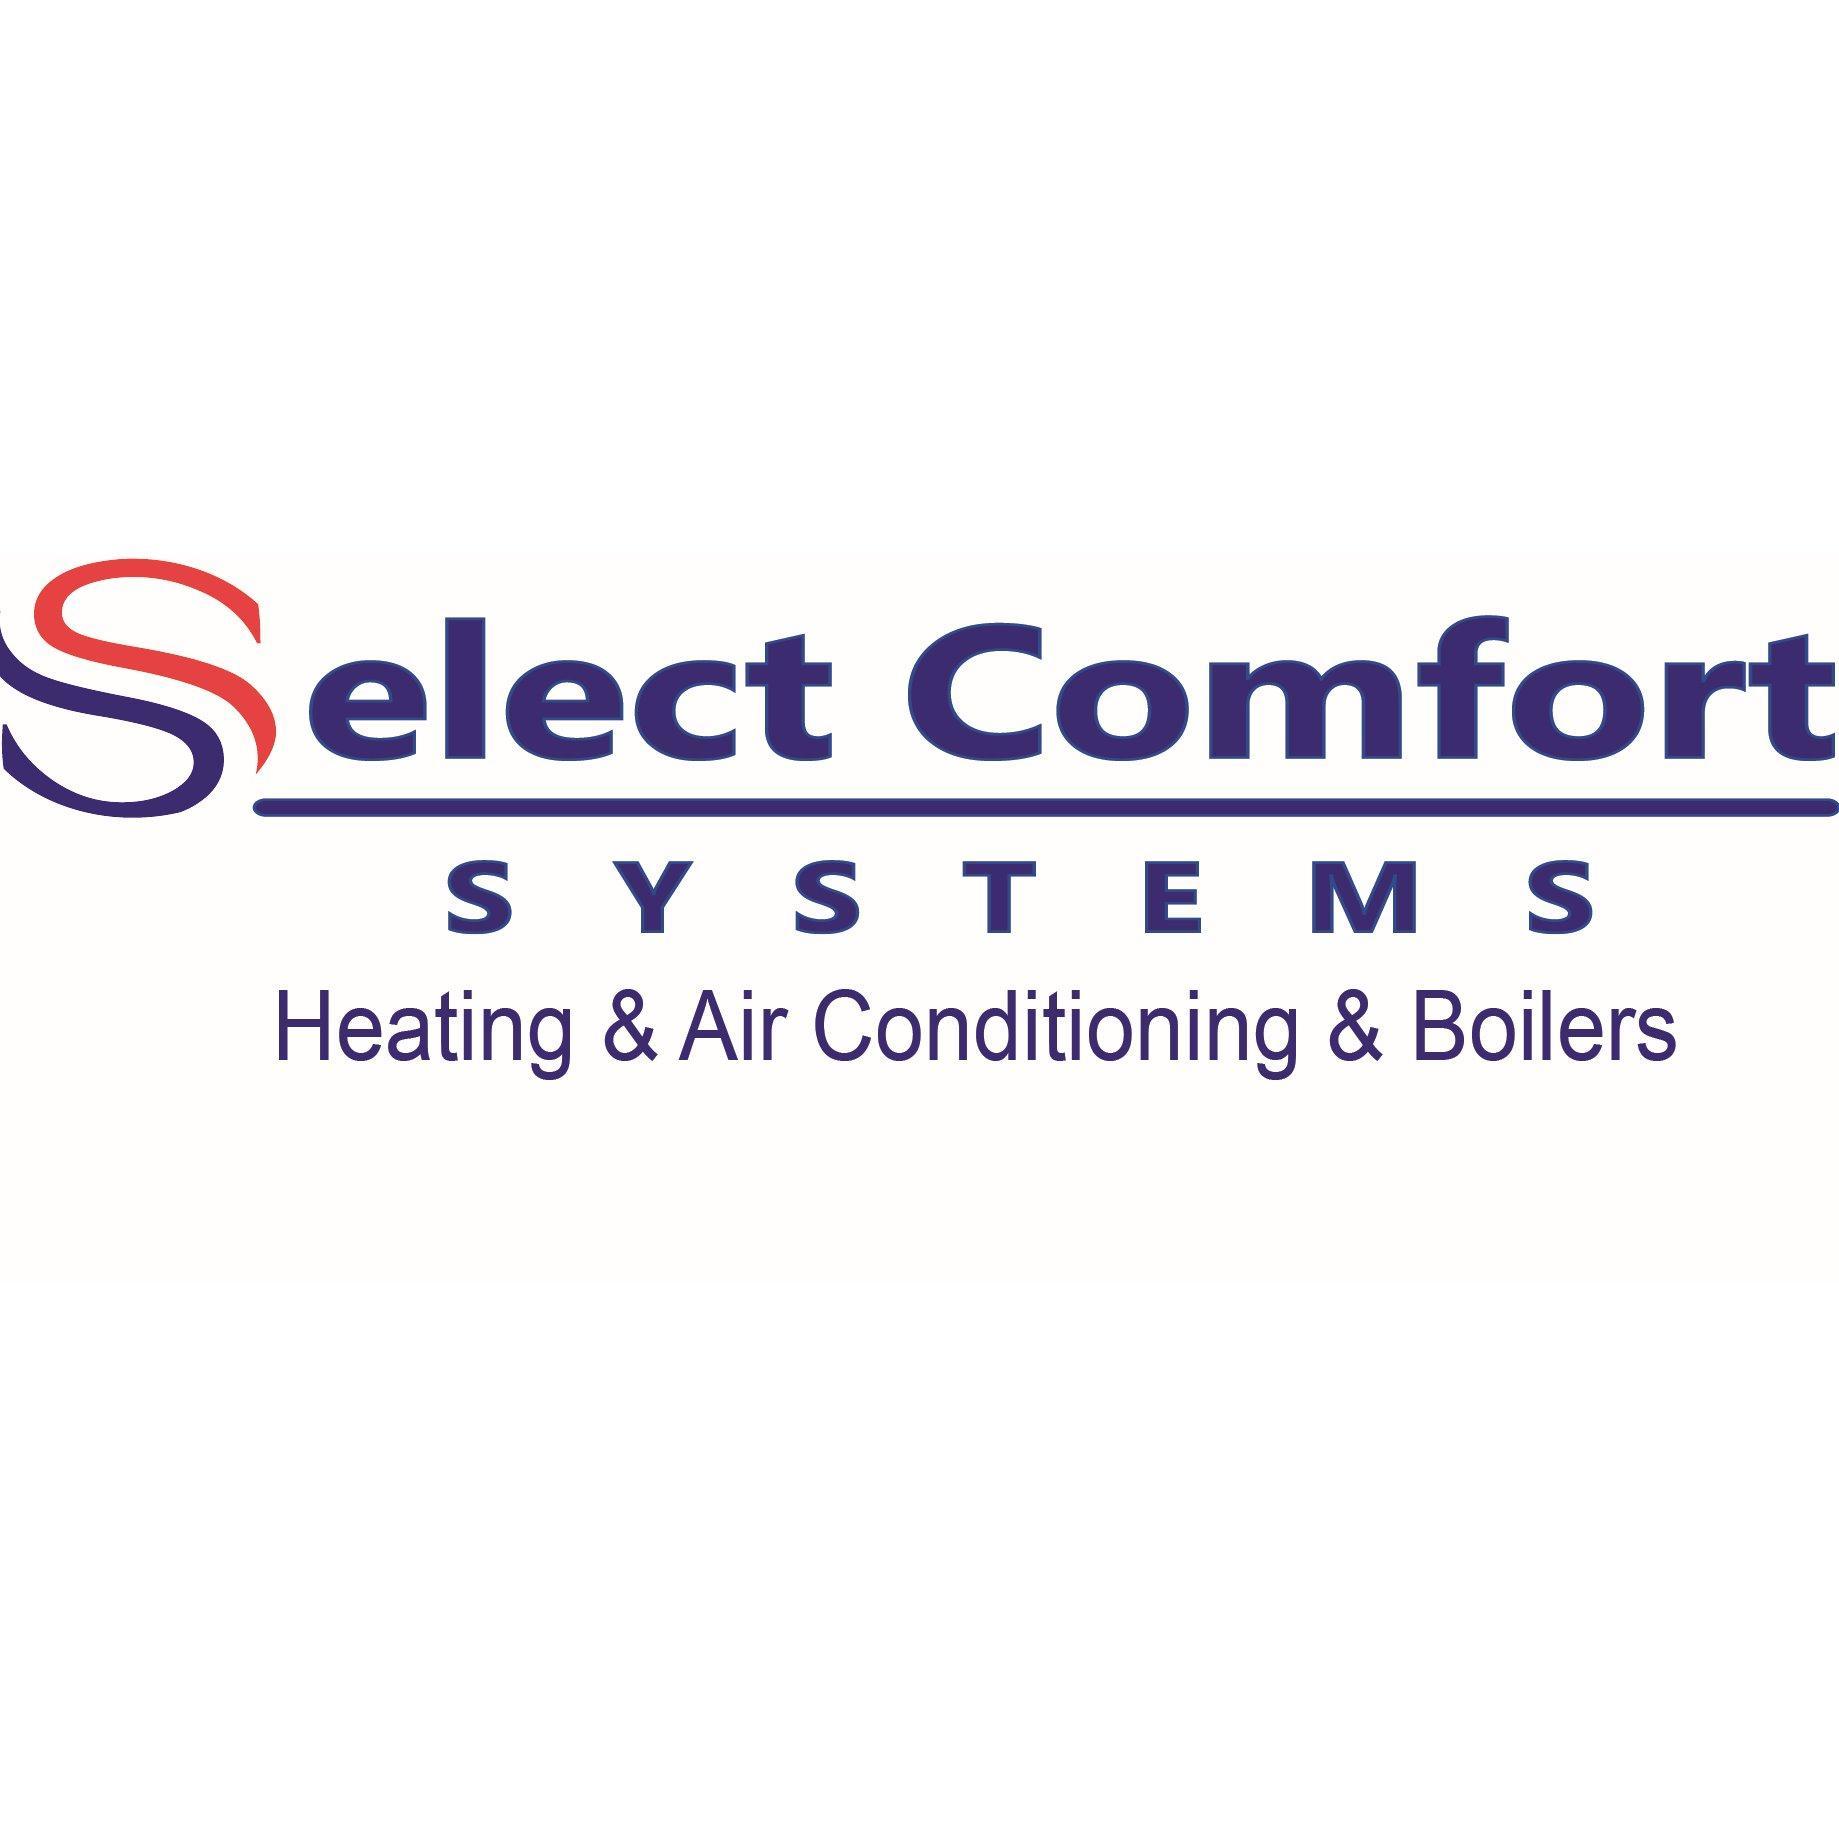 Select Comfort Systems LLC